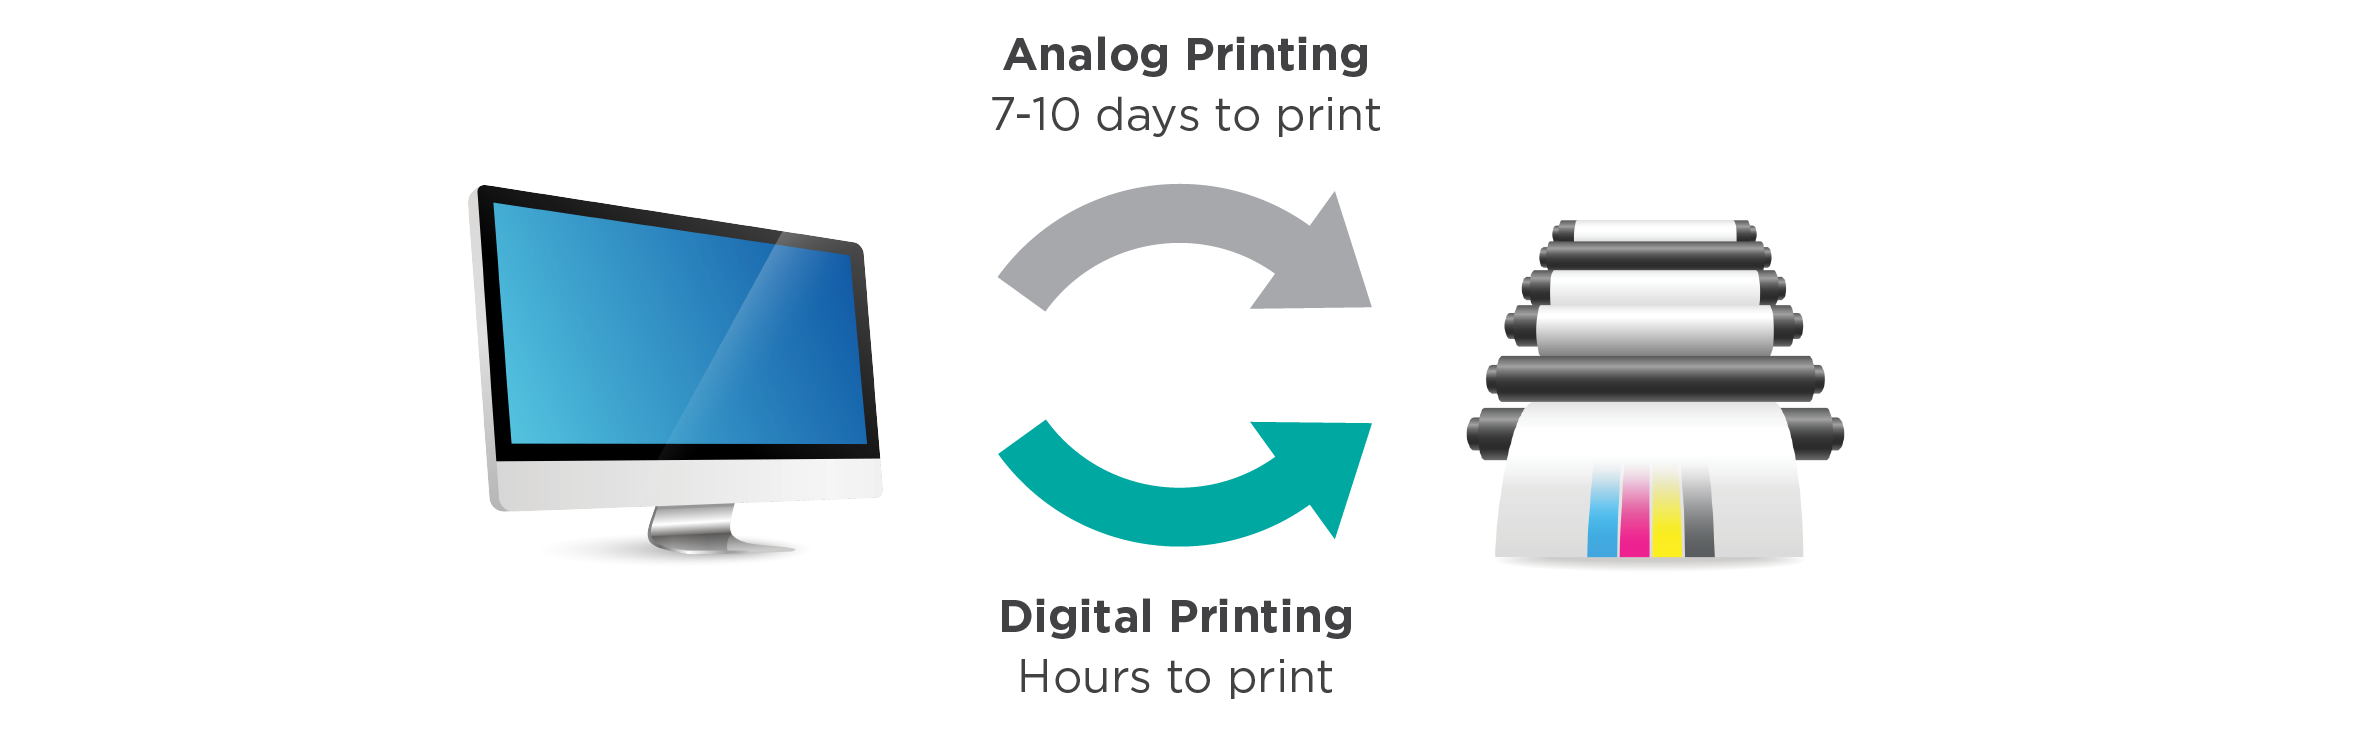 Digital-printing-single-pass-barberan-speed-colorhub